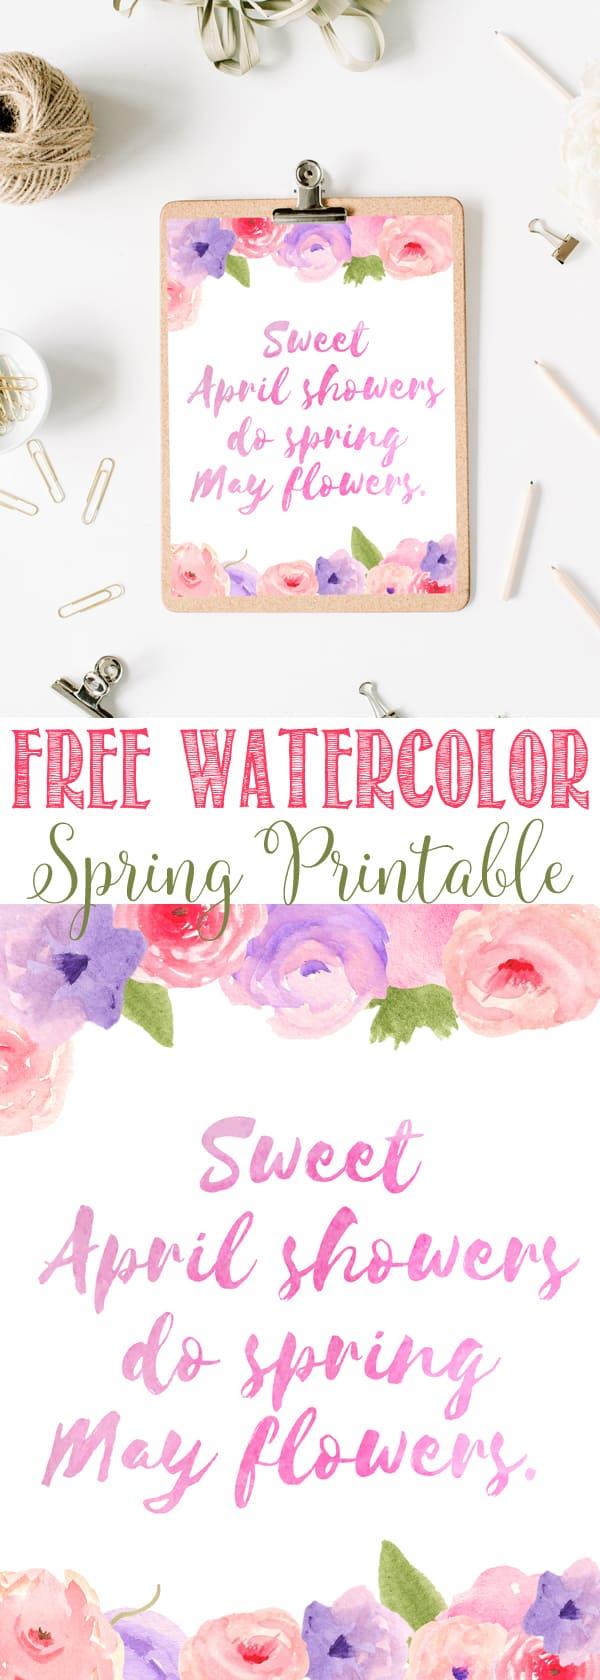 Free Watercolor Spring Flowers Printables | Spring Posey flowers | Spring Pink and Purple Printable